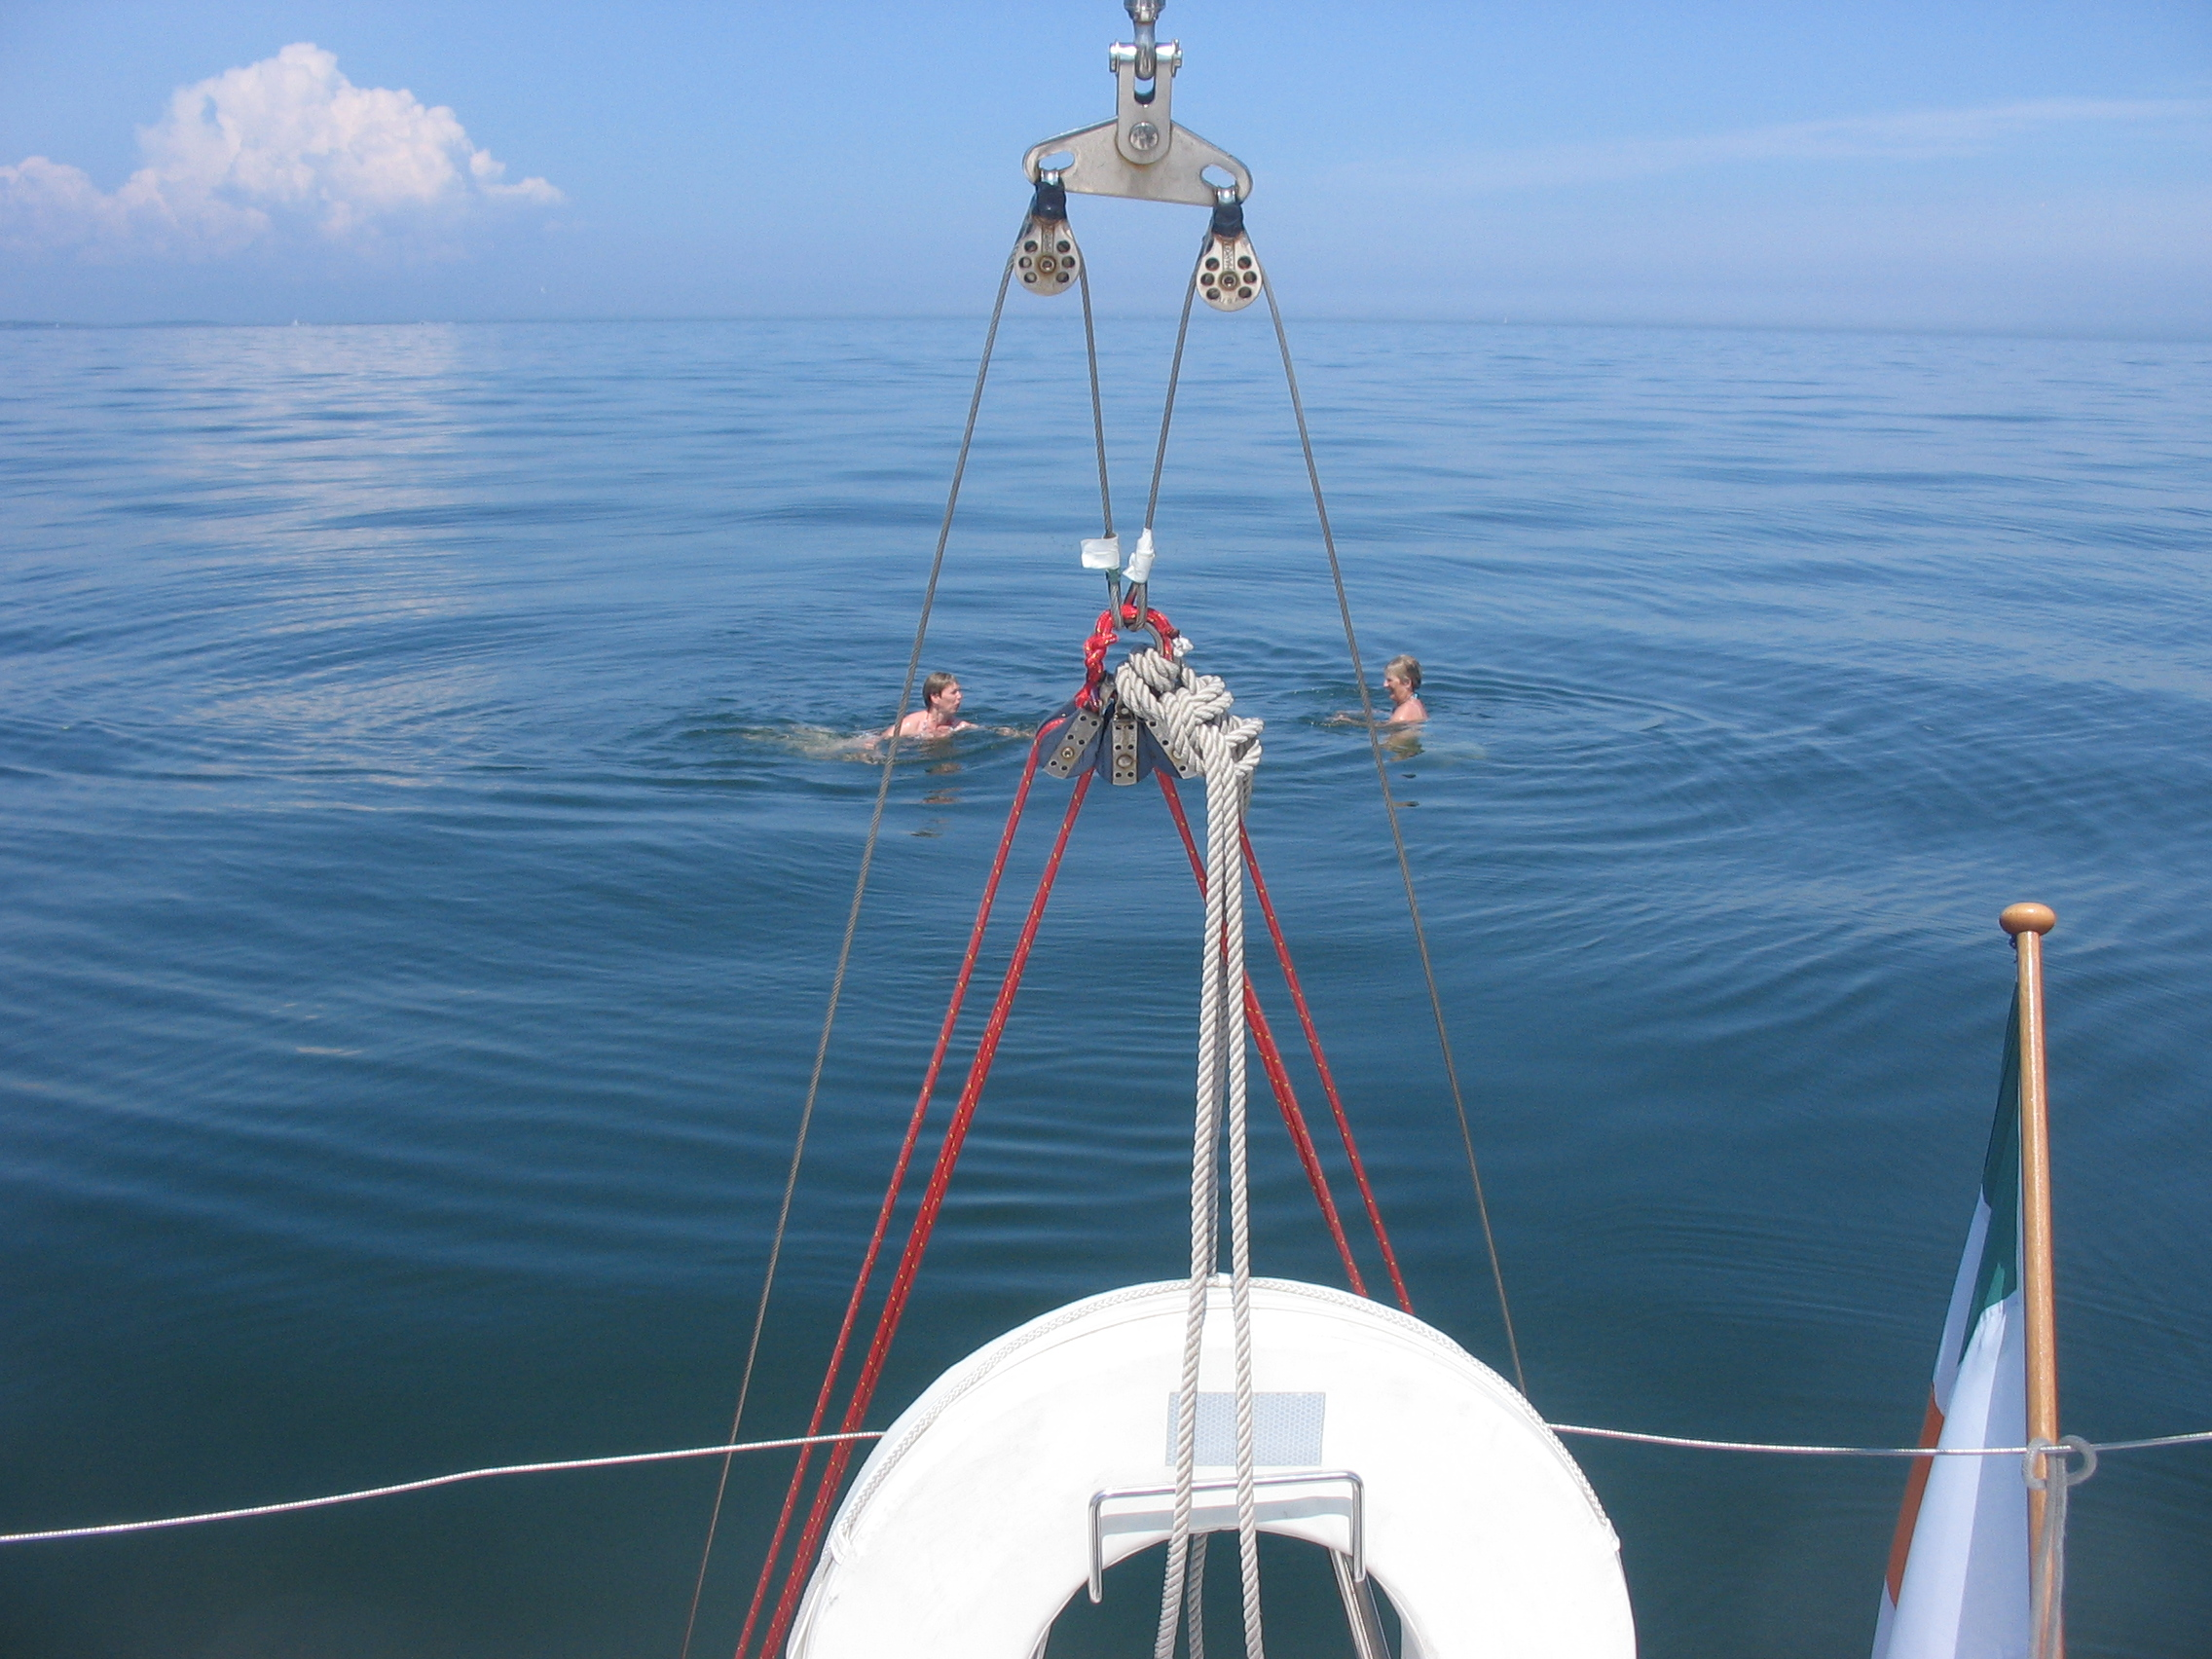 http://www.dinah.sail.ie/wp-content/uploads/2009/06/aileen-louise-swim.jpg